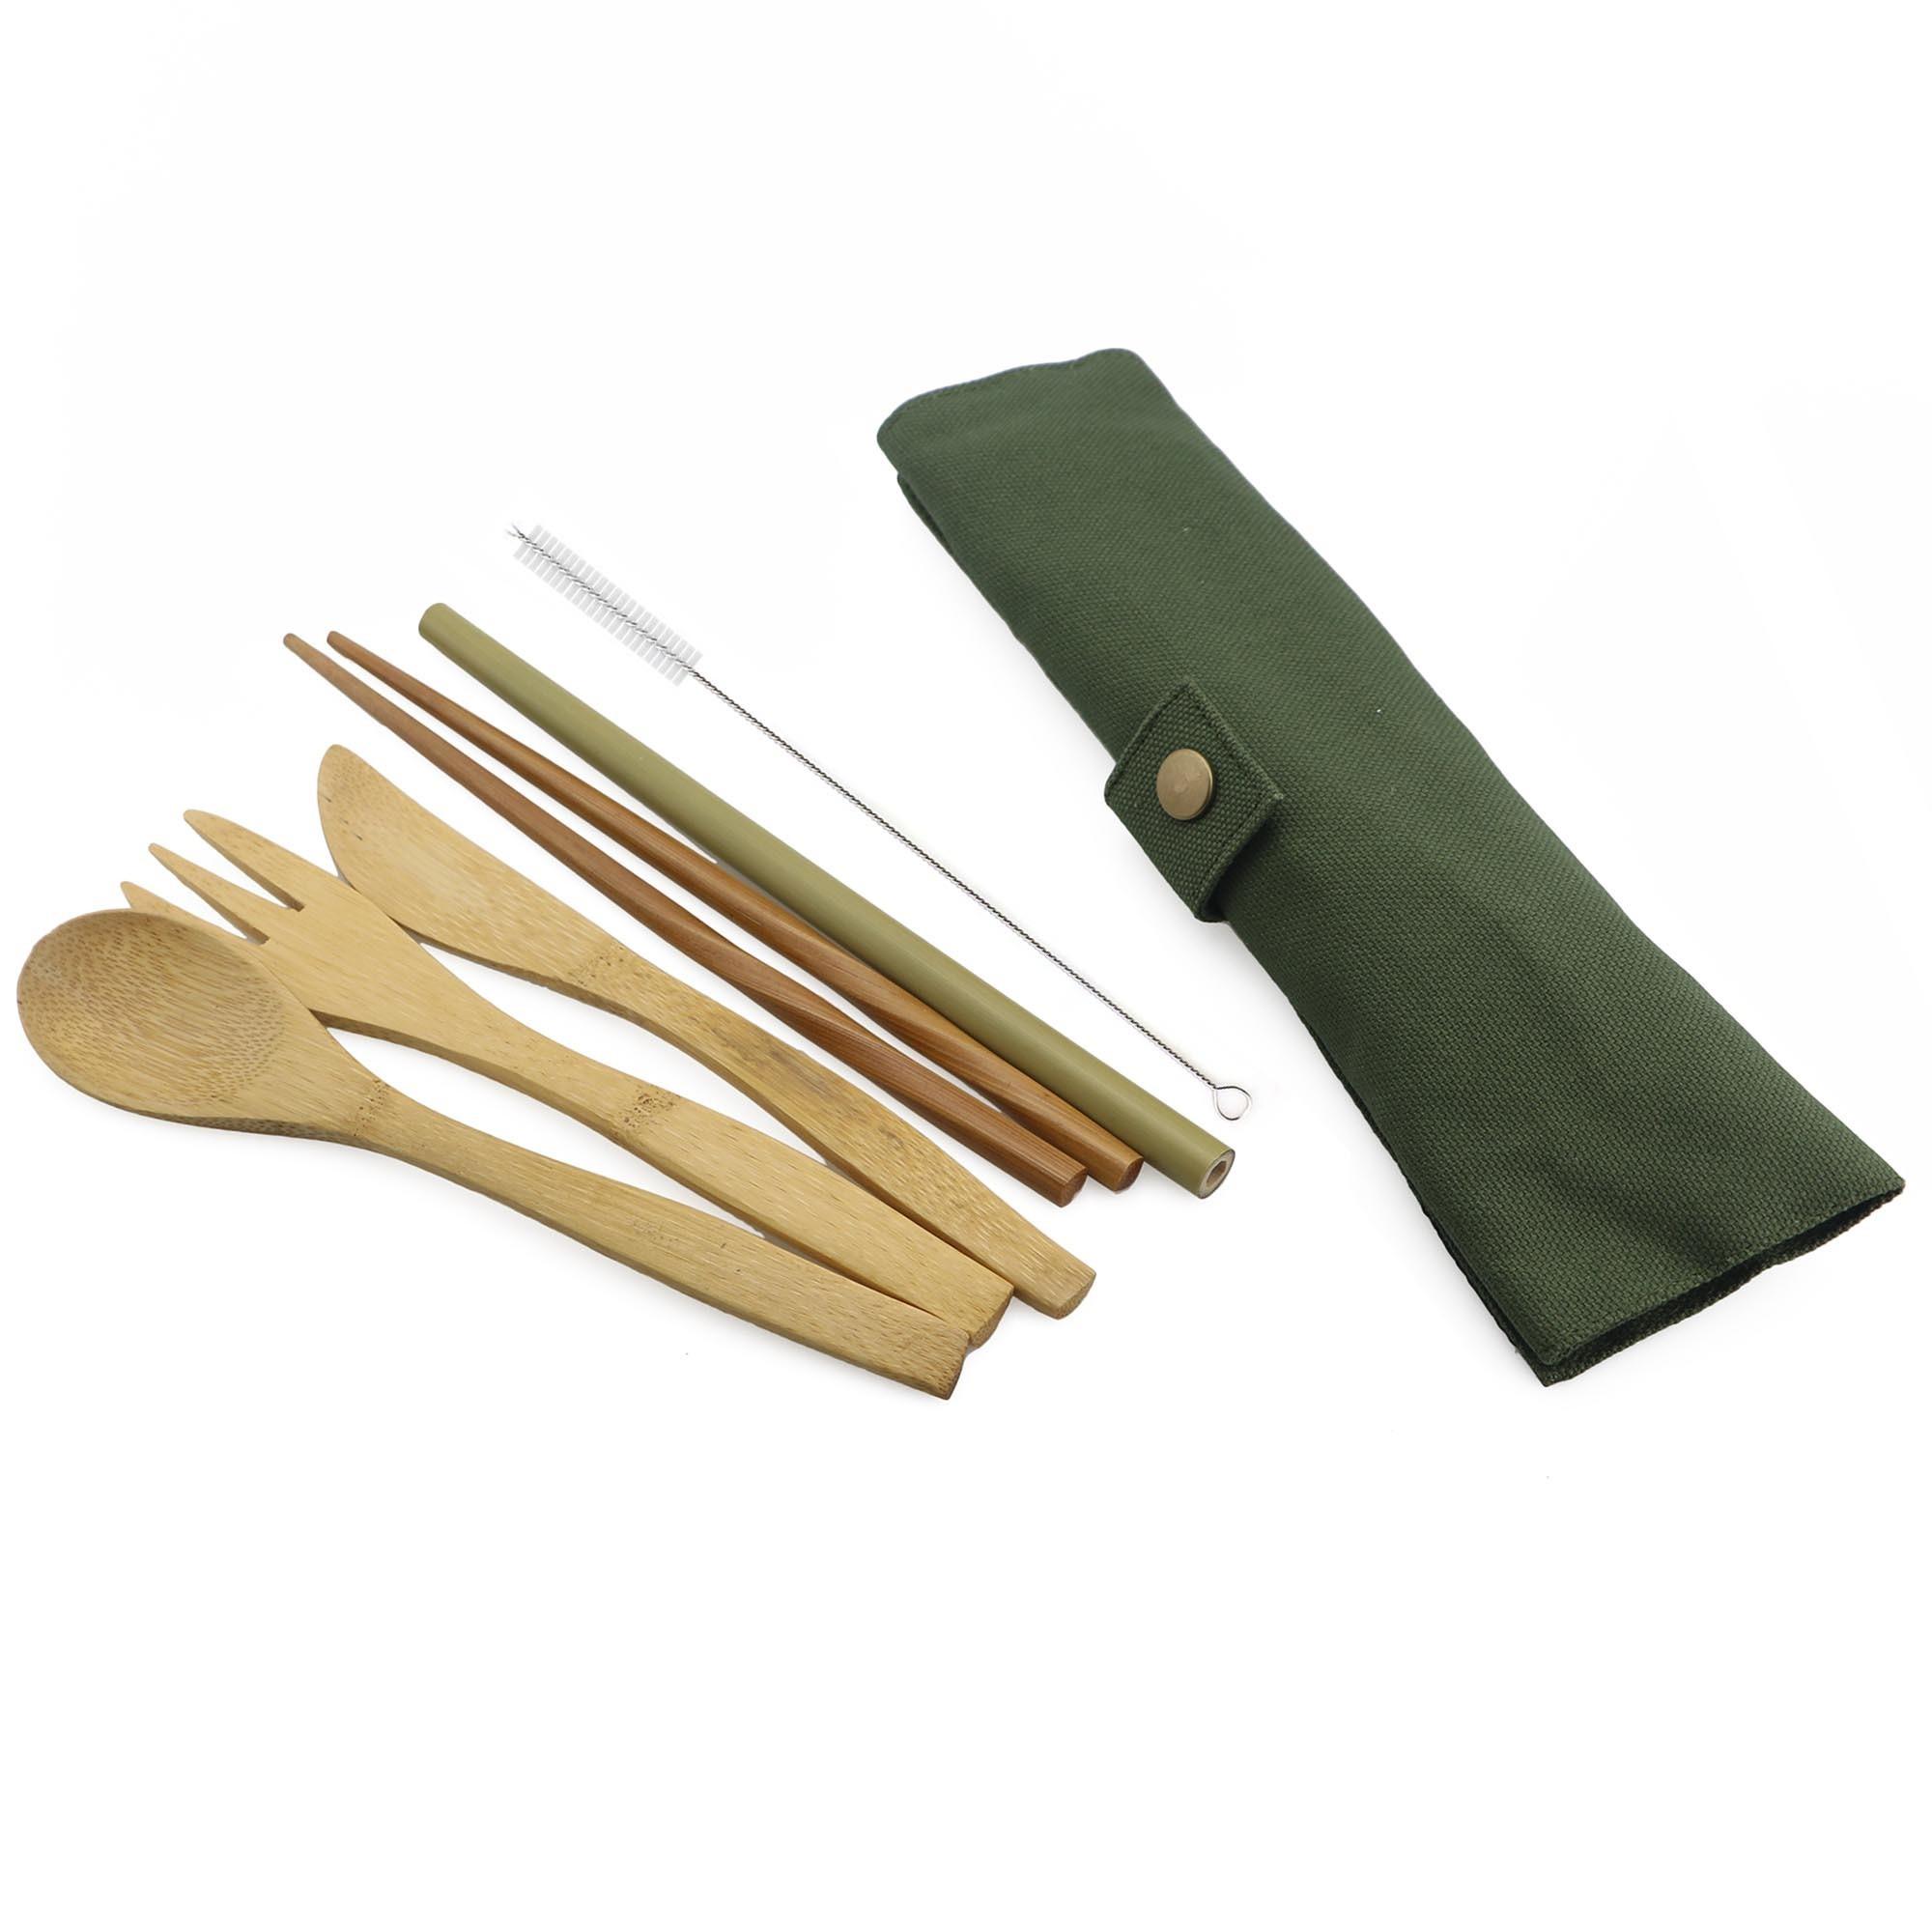 7-piece Light Portable Japanese Wooden Dinnerware Cutlery Set Bamboo Straw Fork Knife With Chopsticks Straws Bag Useful Travel C19042101